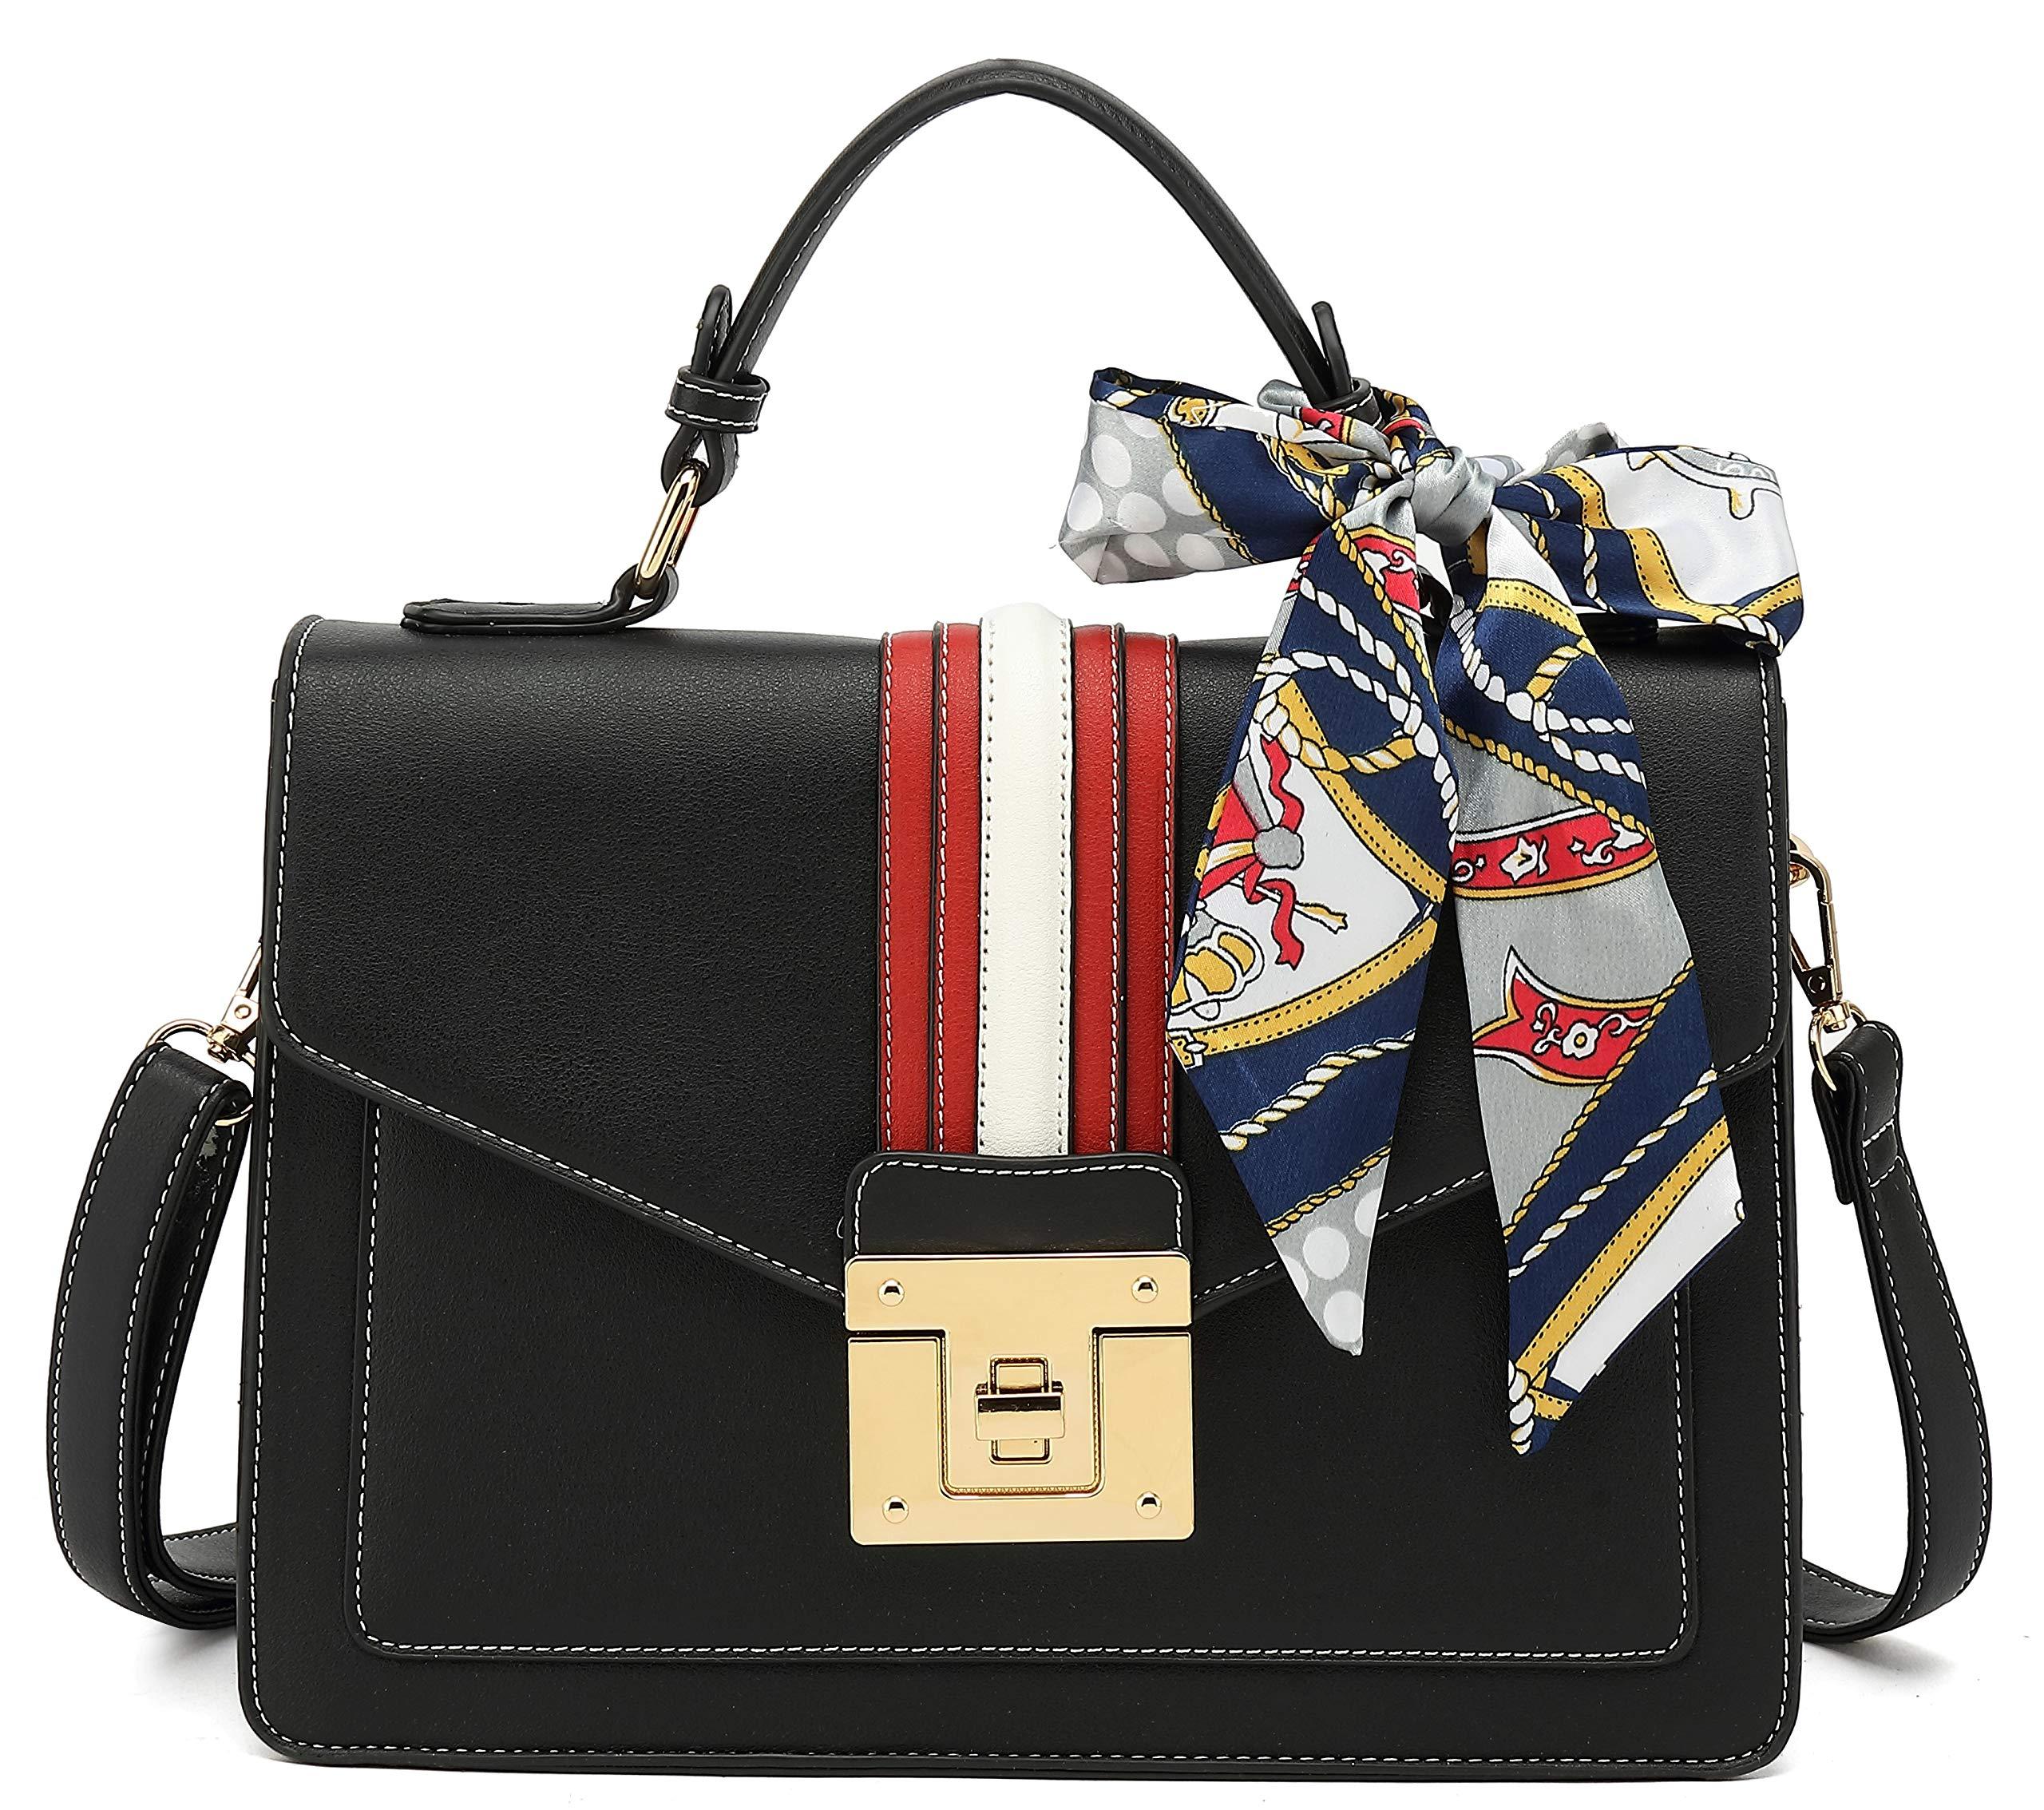 Scarleton Large Top Handle Satchel Handbag for Women H2065